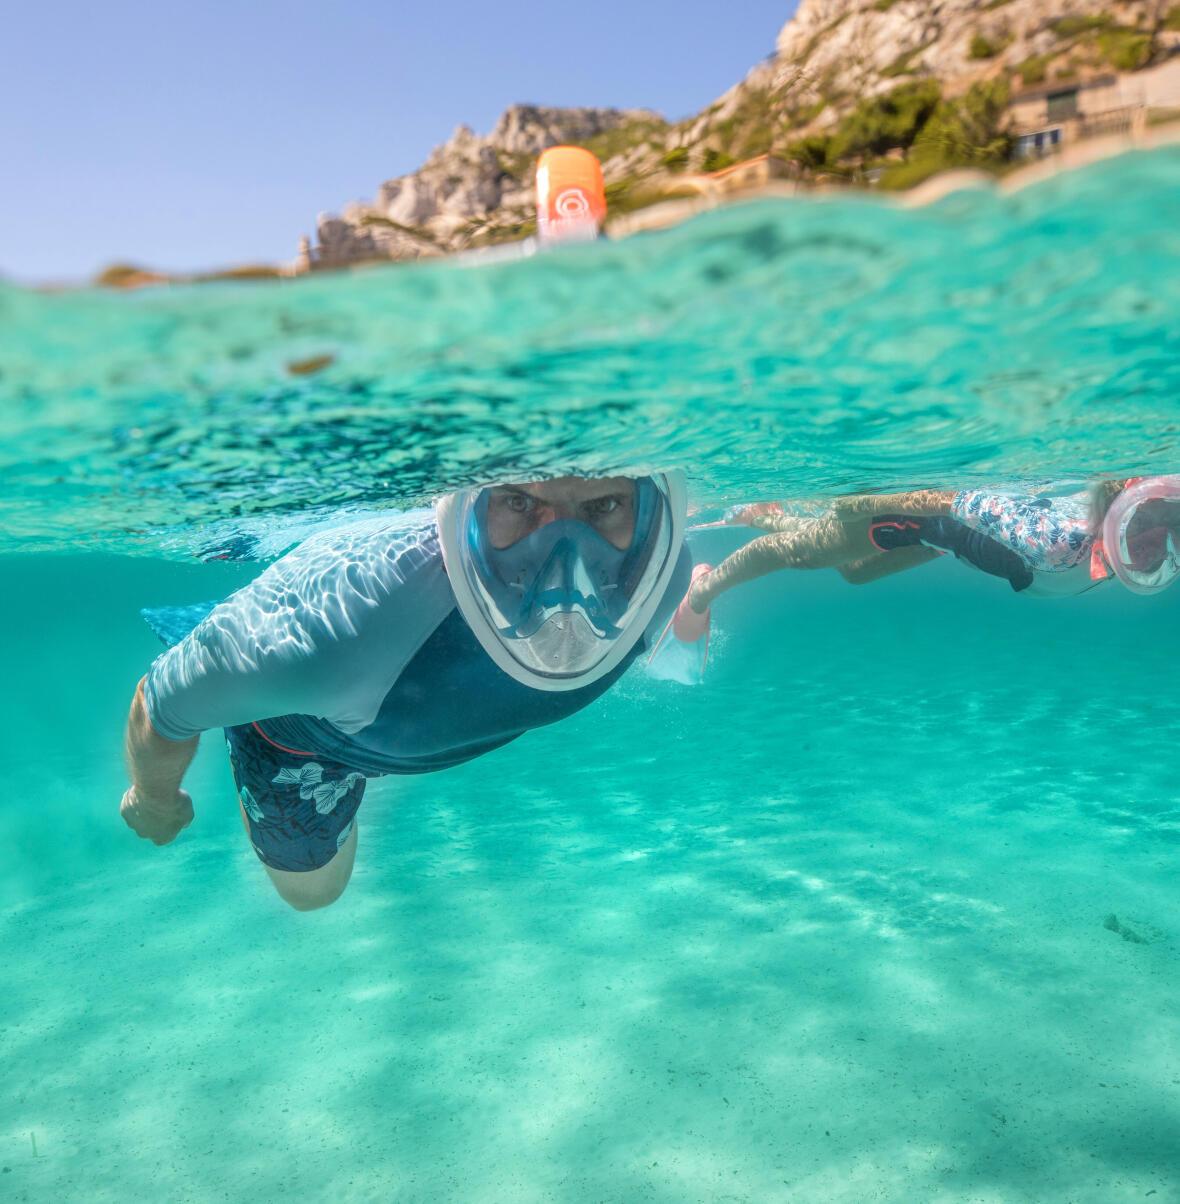 snorkeling kayak rules